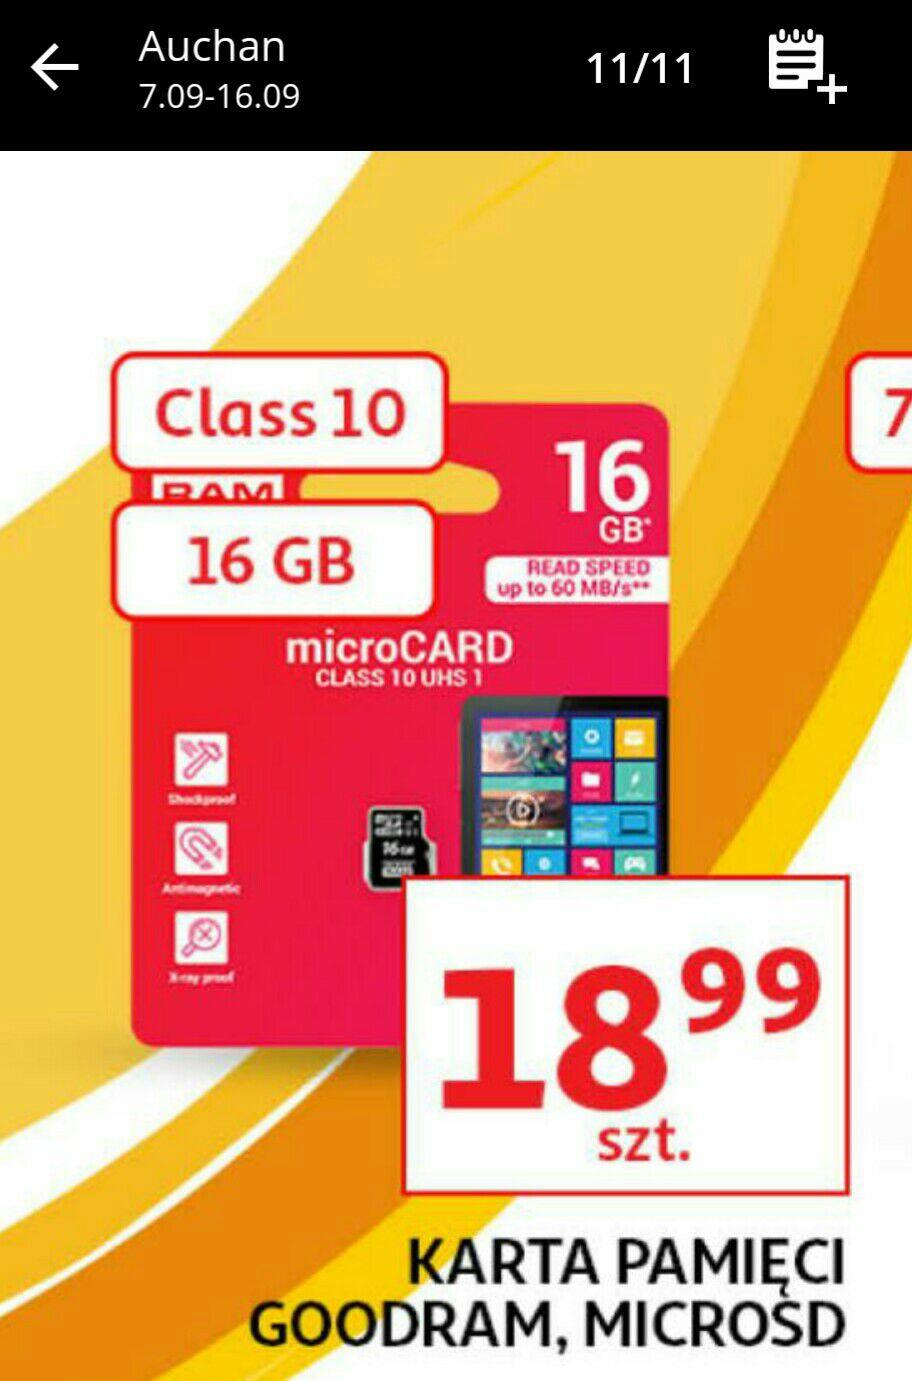 Auchan - karta pamięci microSD 16GB - GOODRAM